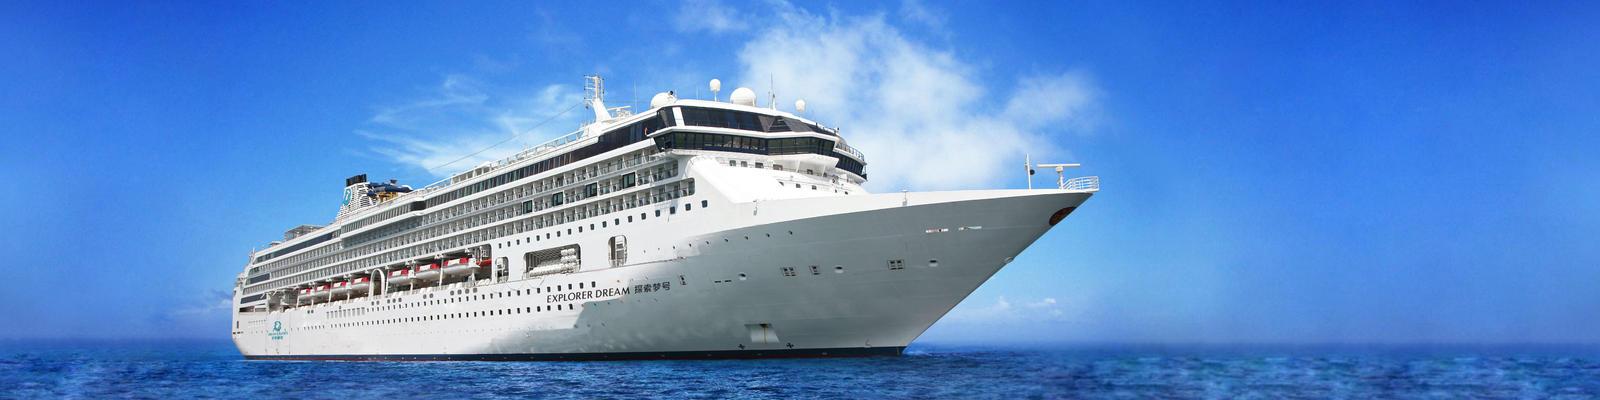 Explorer Dream (Image: Dream Cruise Line)